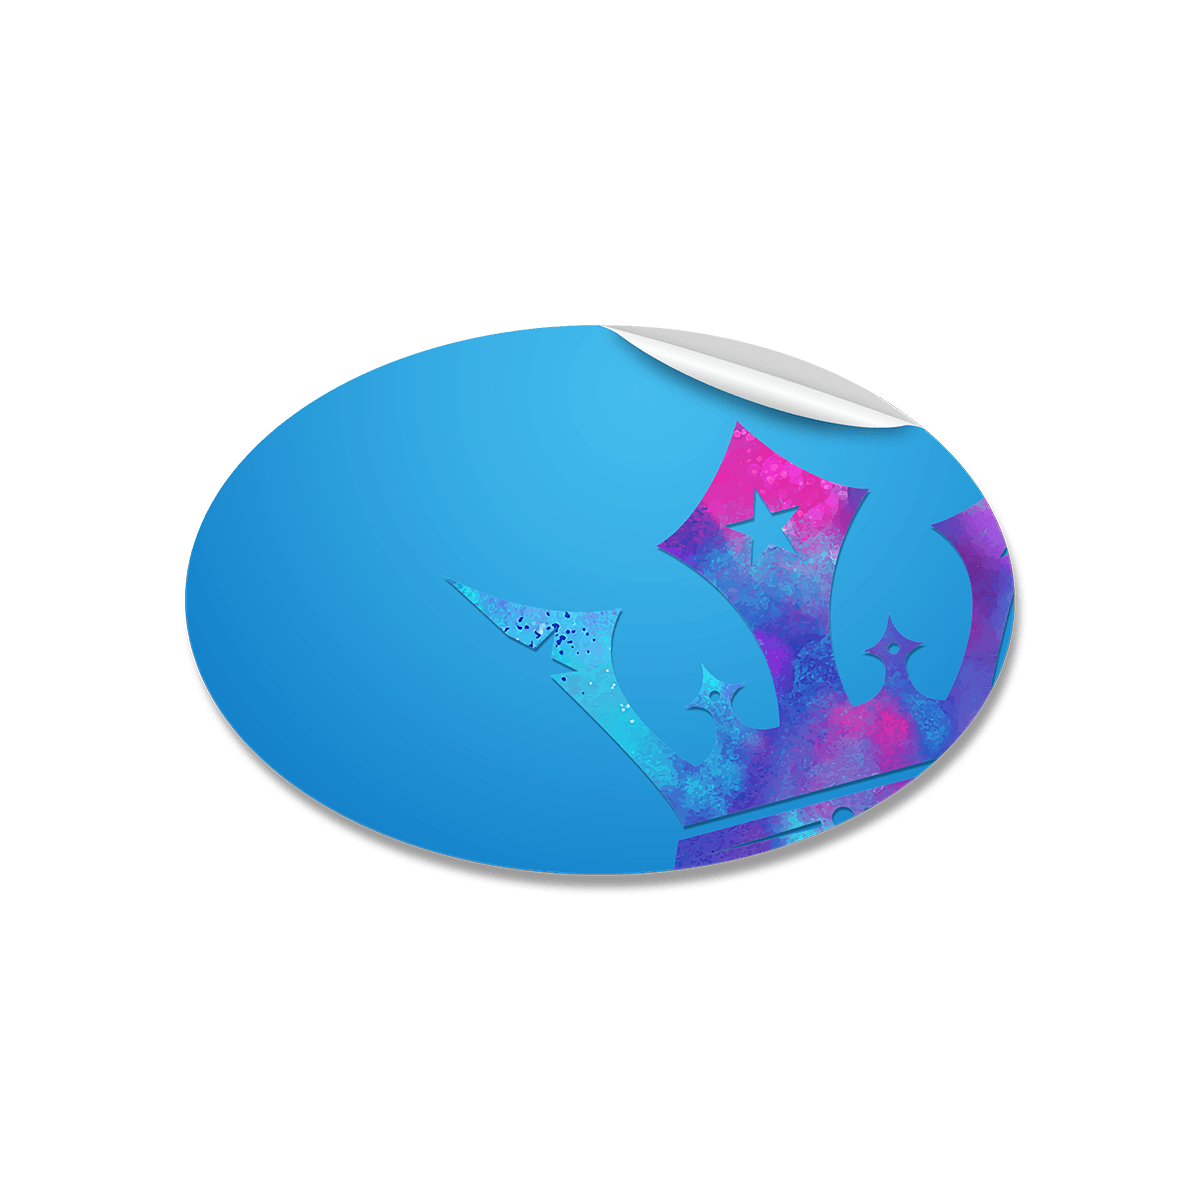 Ovale Aufkleber Drucken